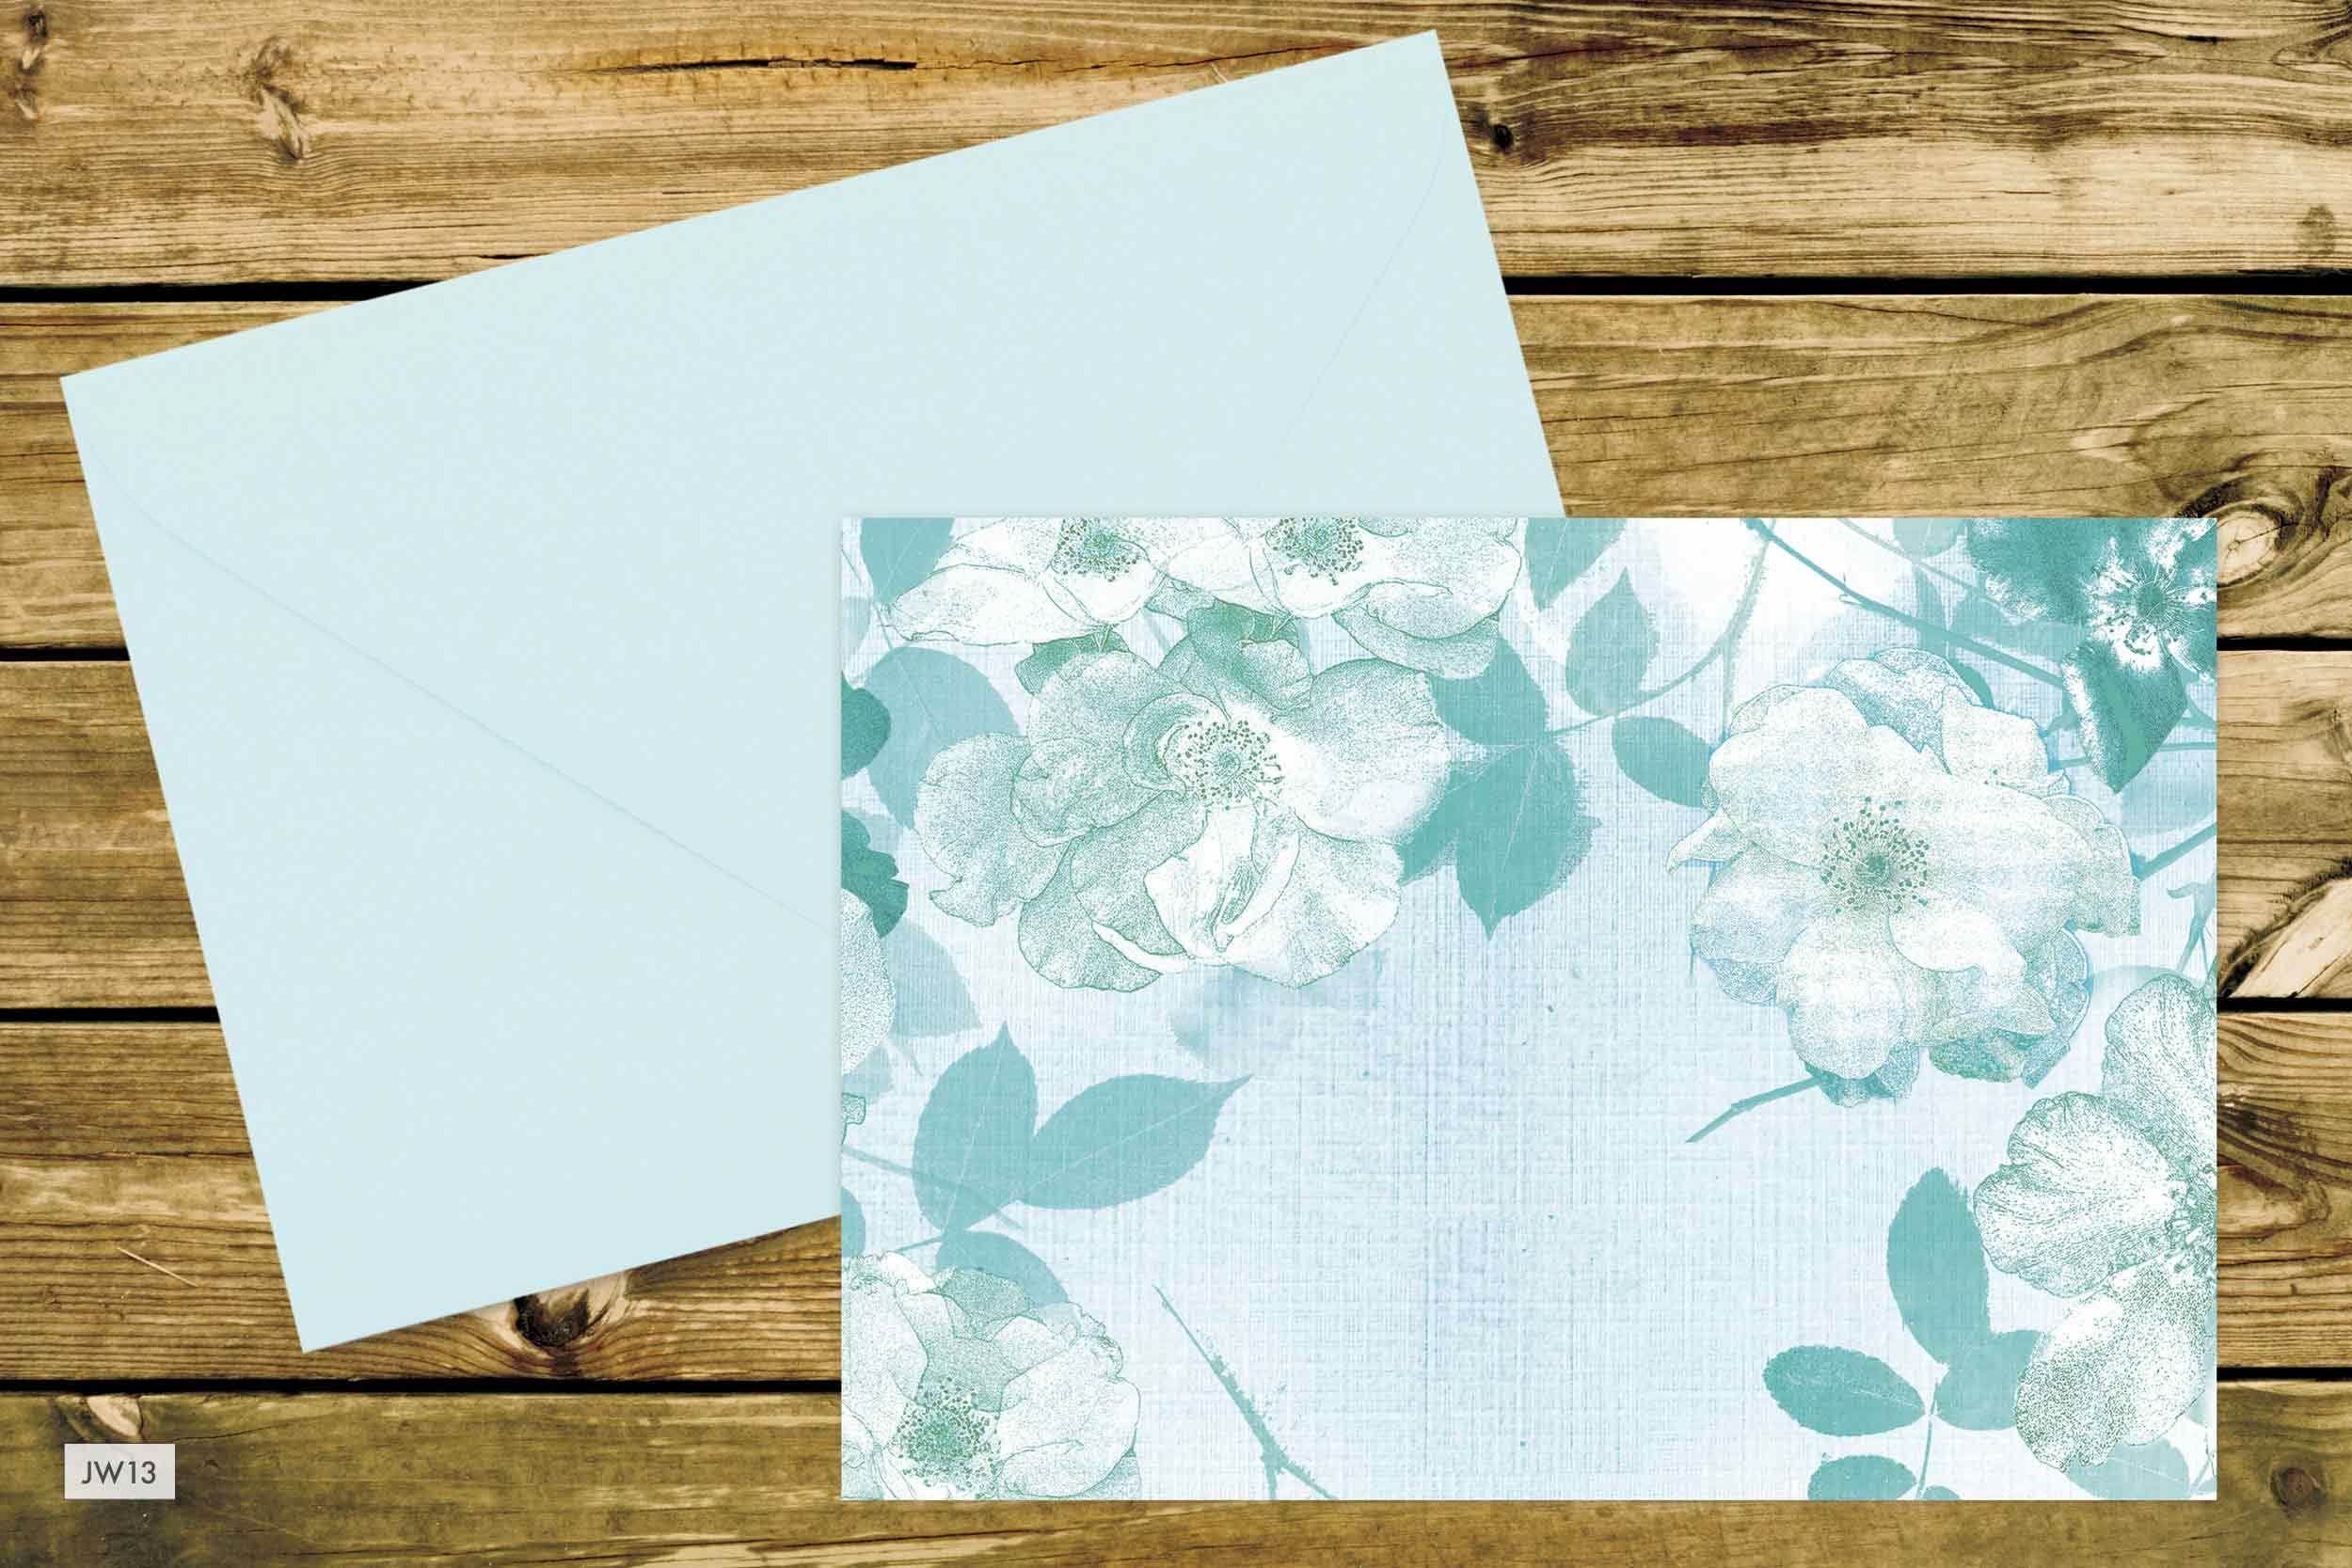 teal_rose_wedding-invitation_ananyacards.com-01.jpg